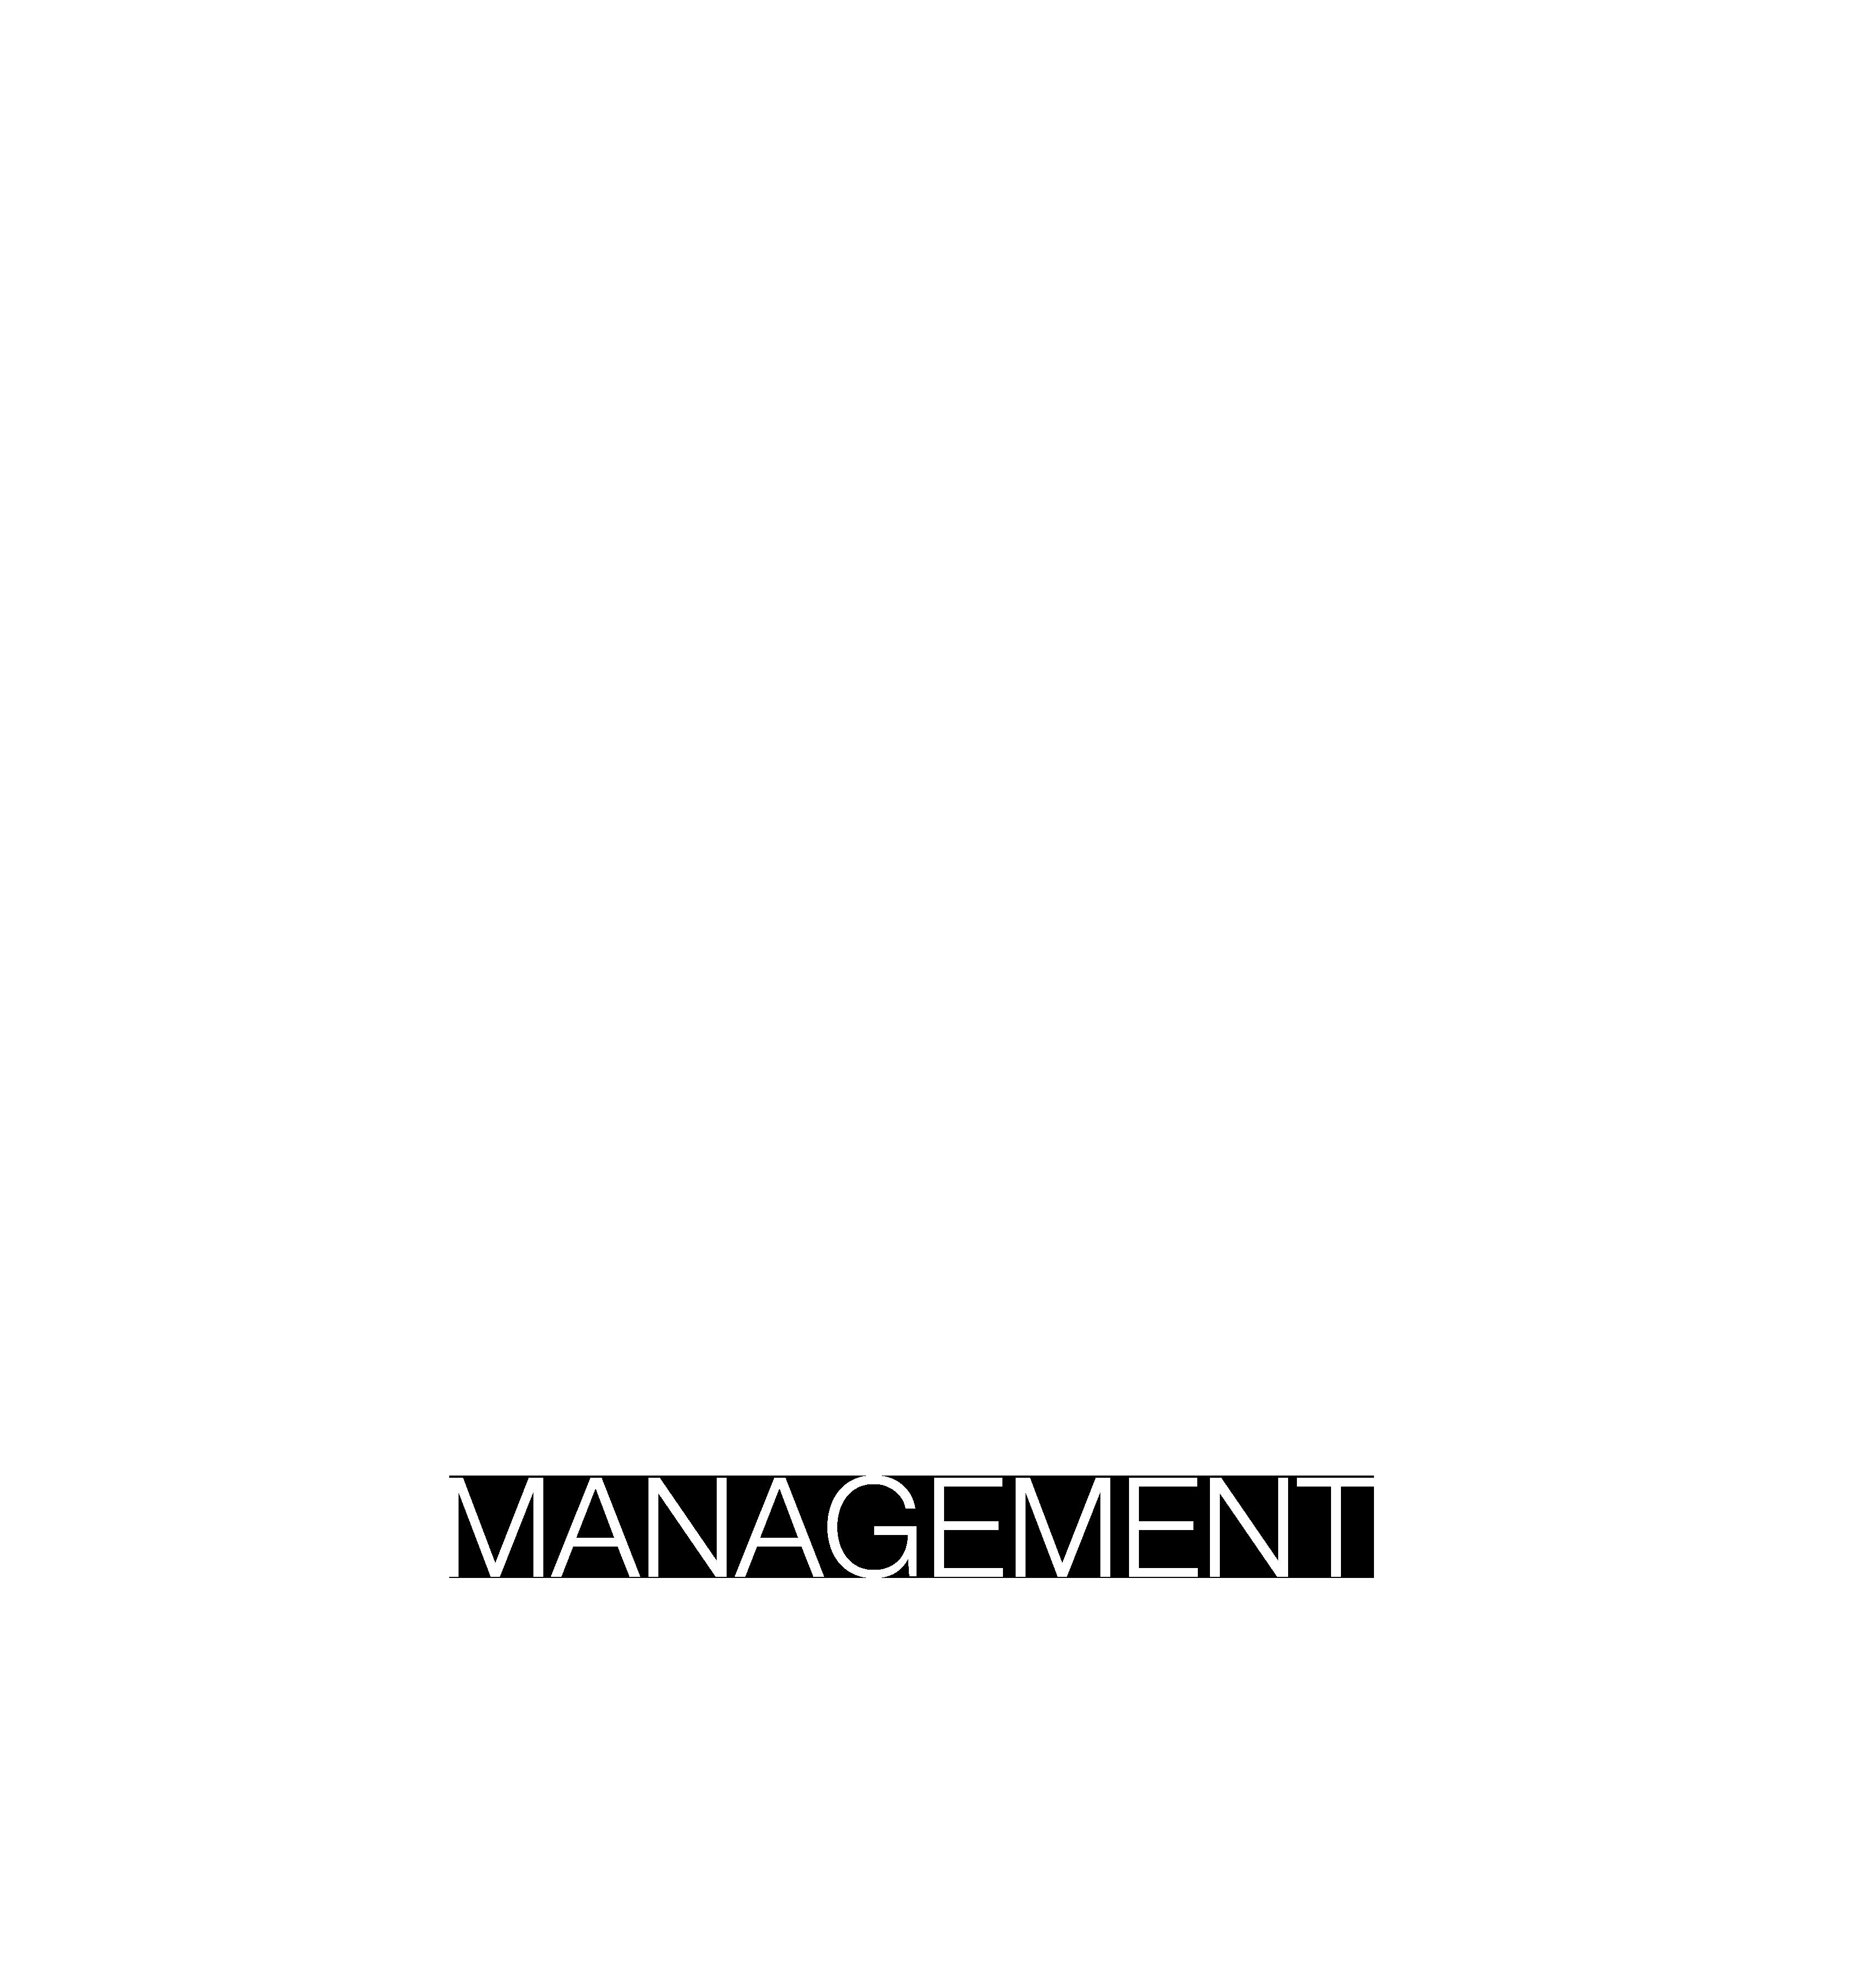 Versus Talent Management